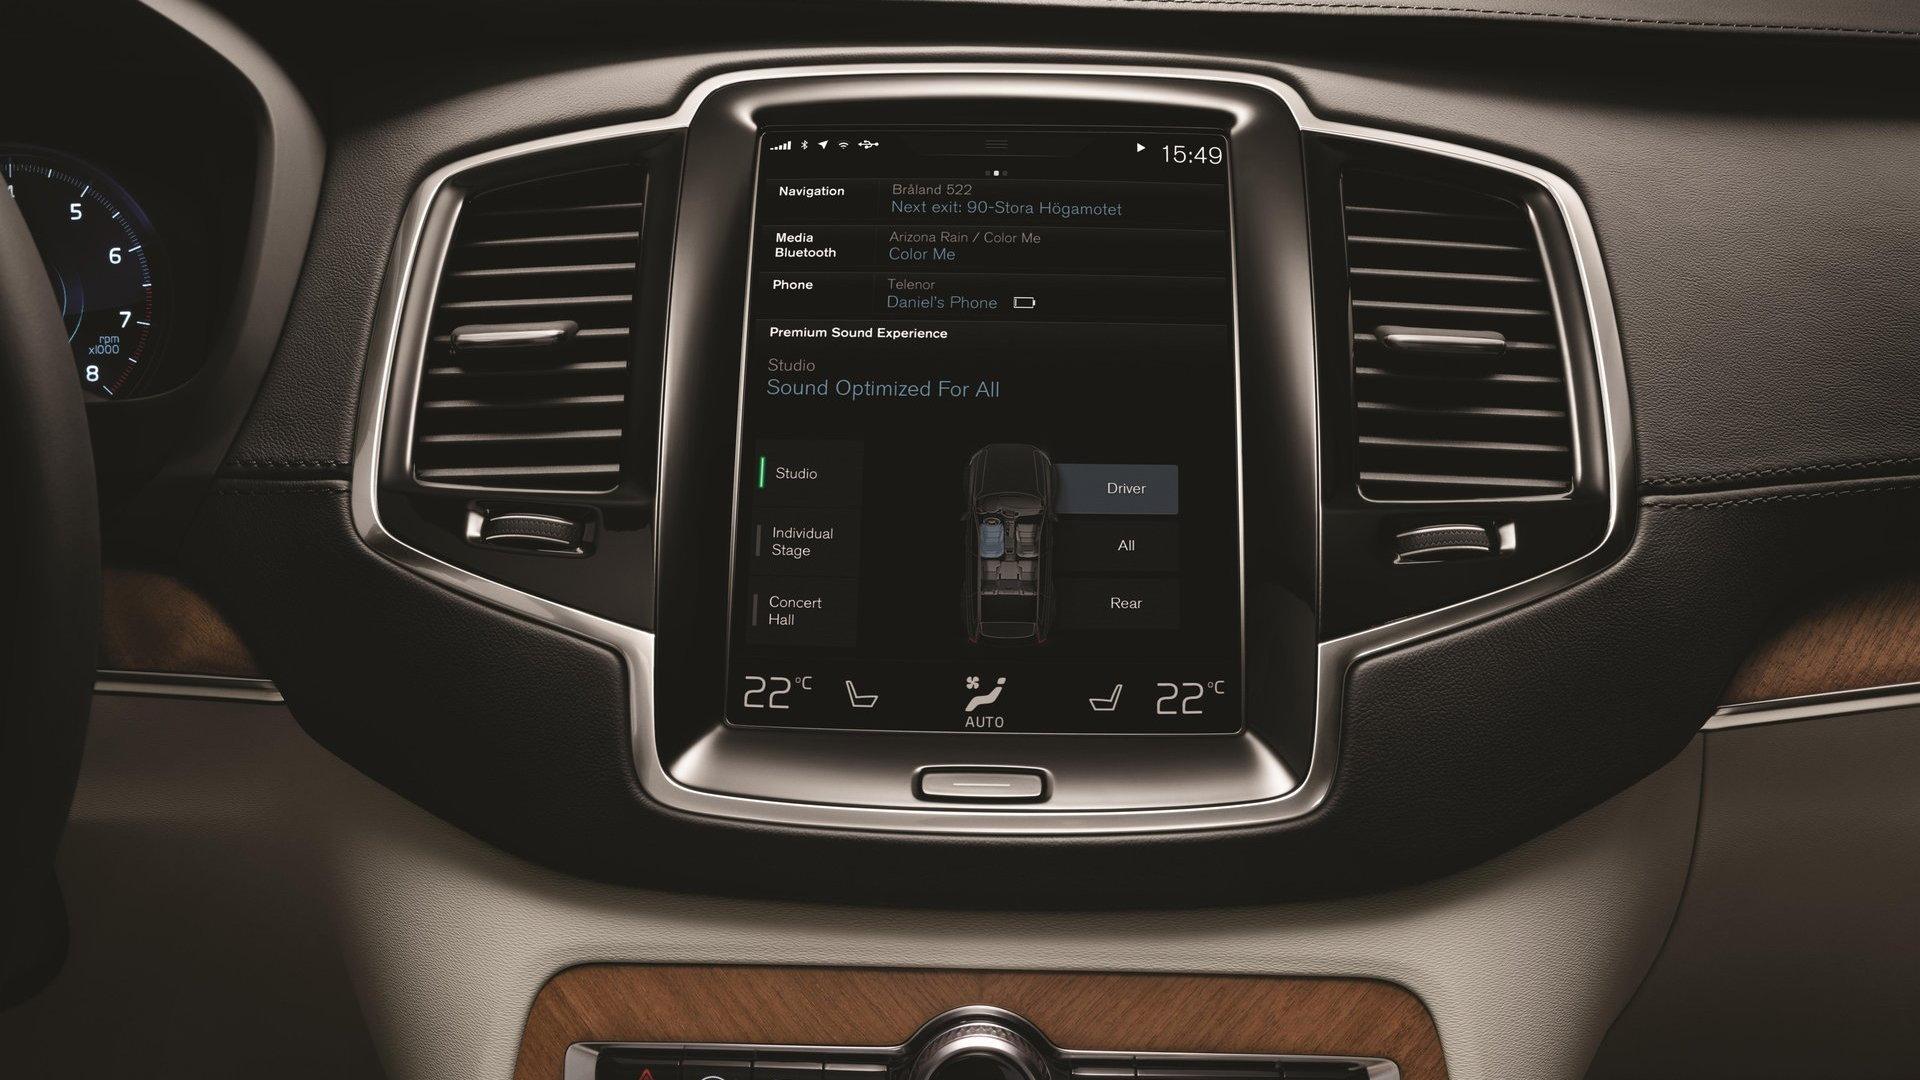 Volvo Sensus infotainment system  -  in 2016 Volvo XC90